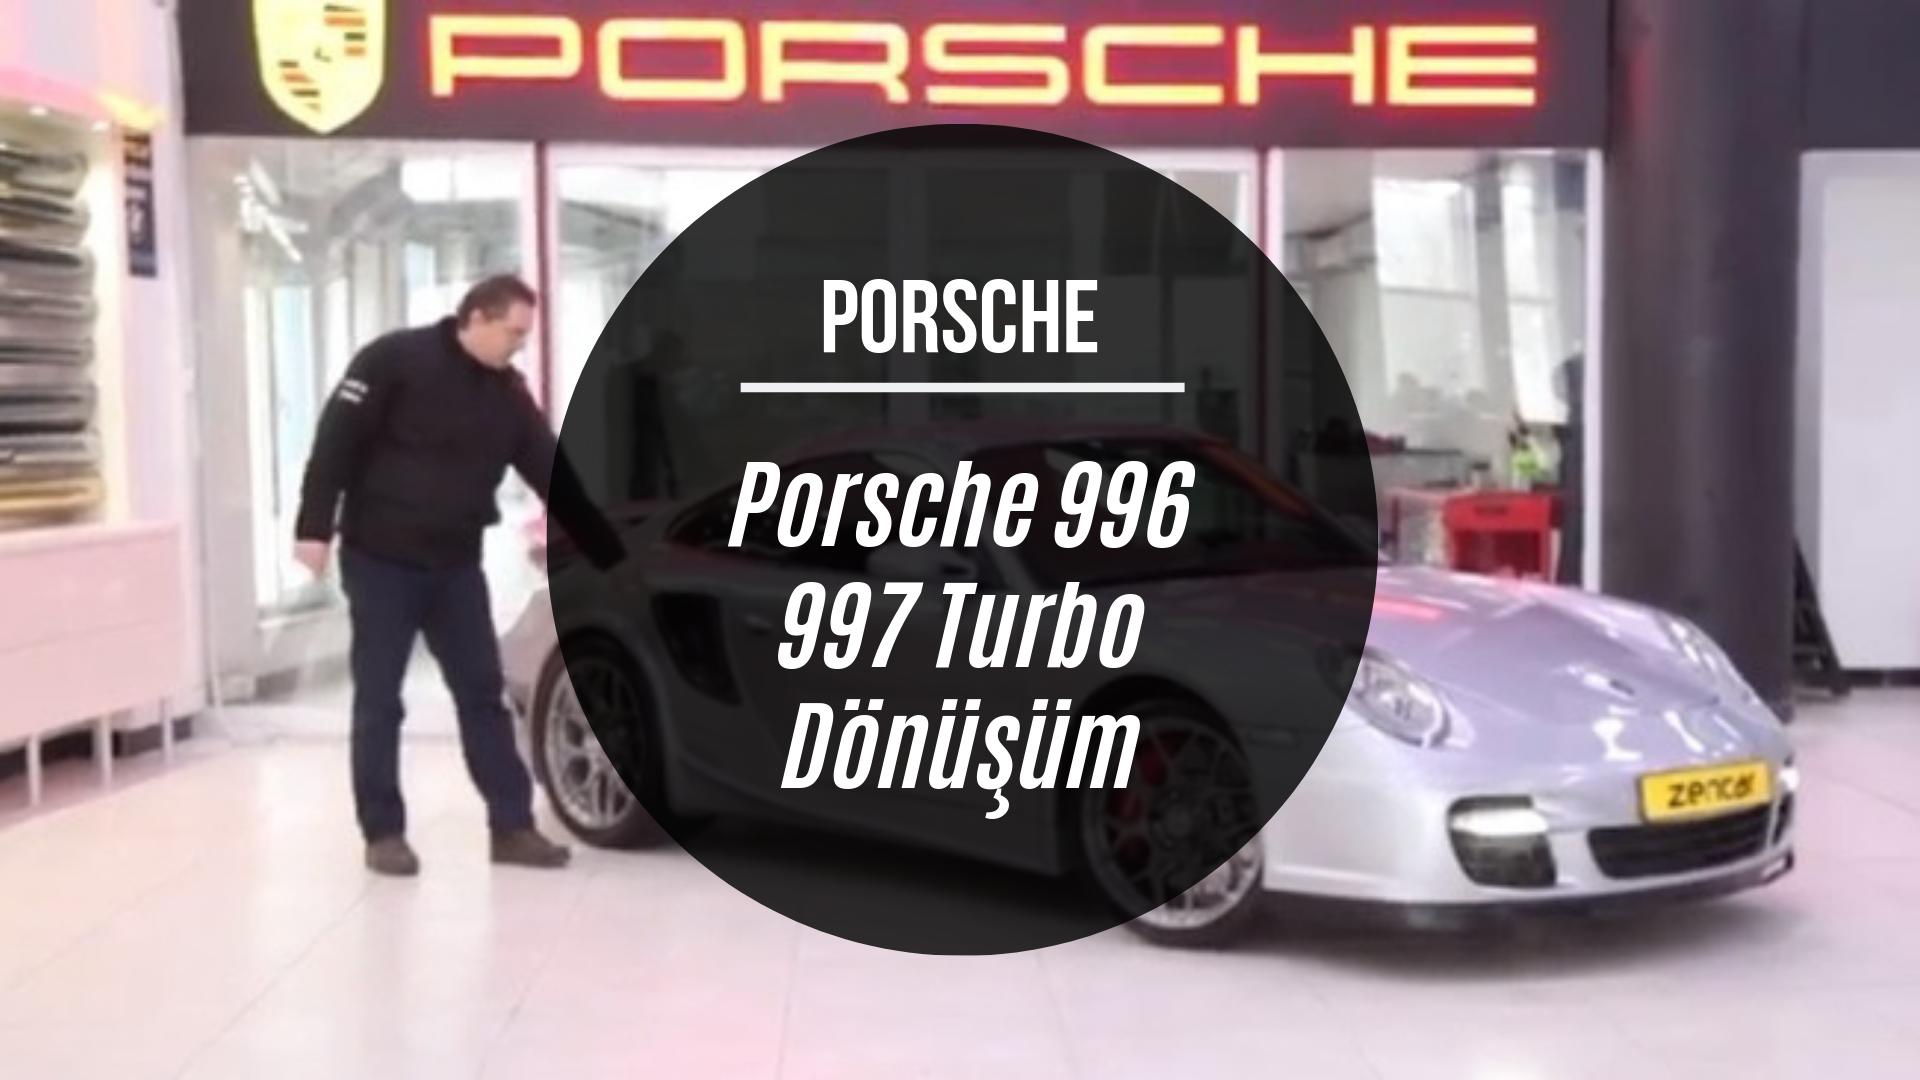 2003 Model PORSCHE 996 2011 Model PORSCHE 997 Turbo Dönüşüm